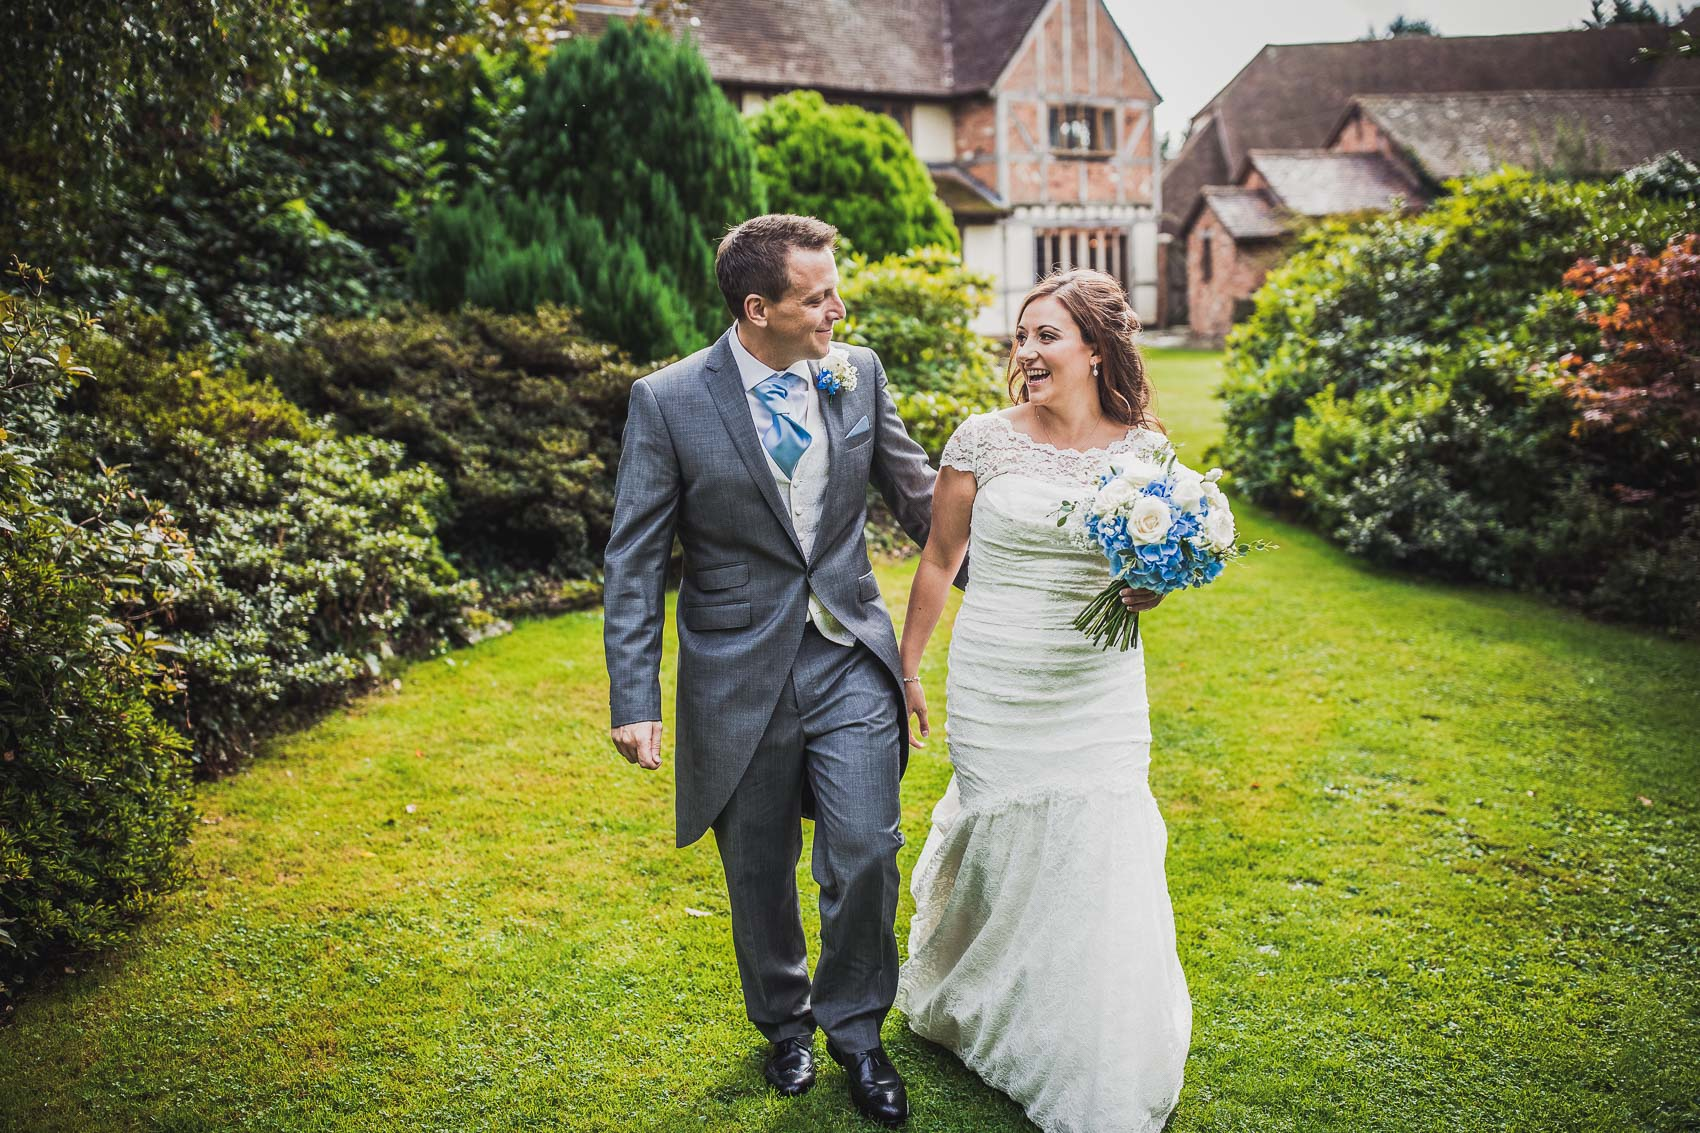 Rivervale Barn Wedding Photographer - Oli and Leyla 33